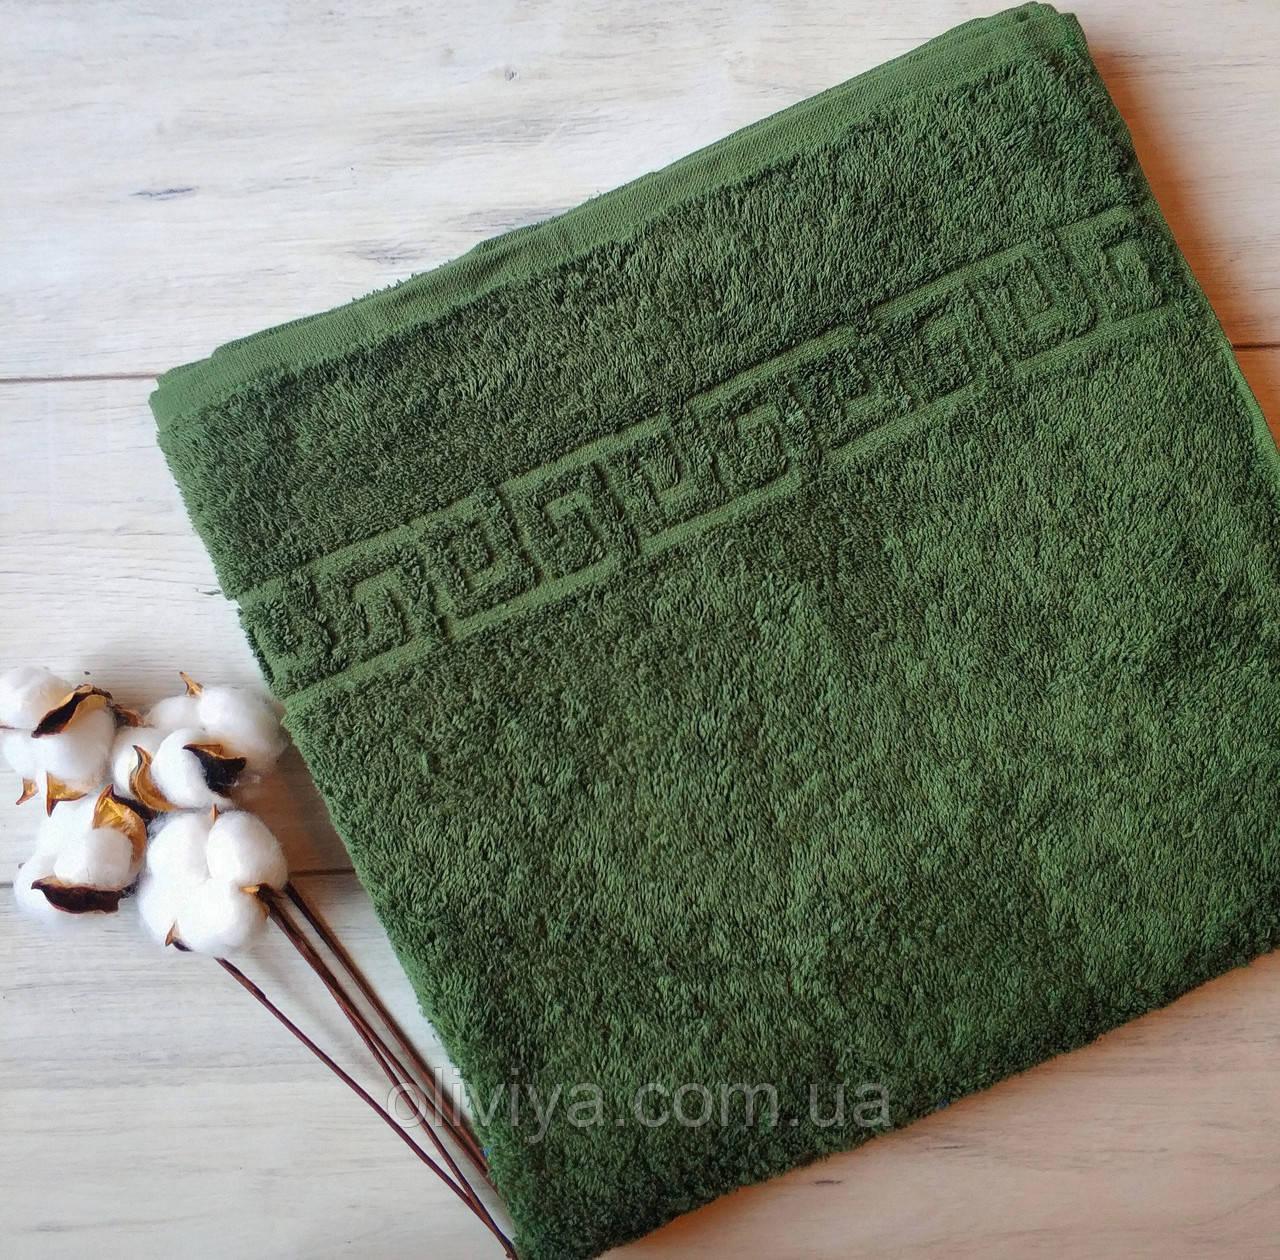 Полотенце для сауны/пляжа (темно-зеленое)